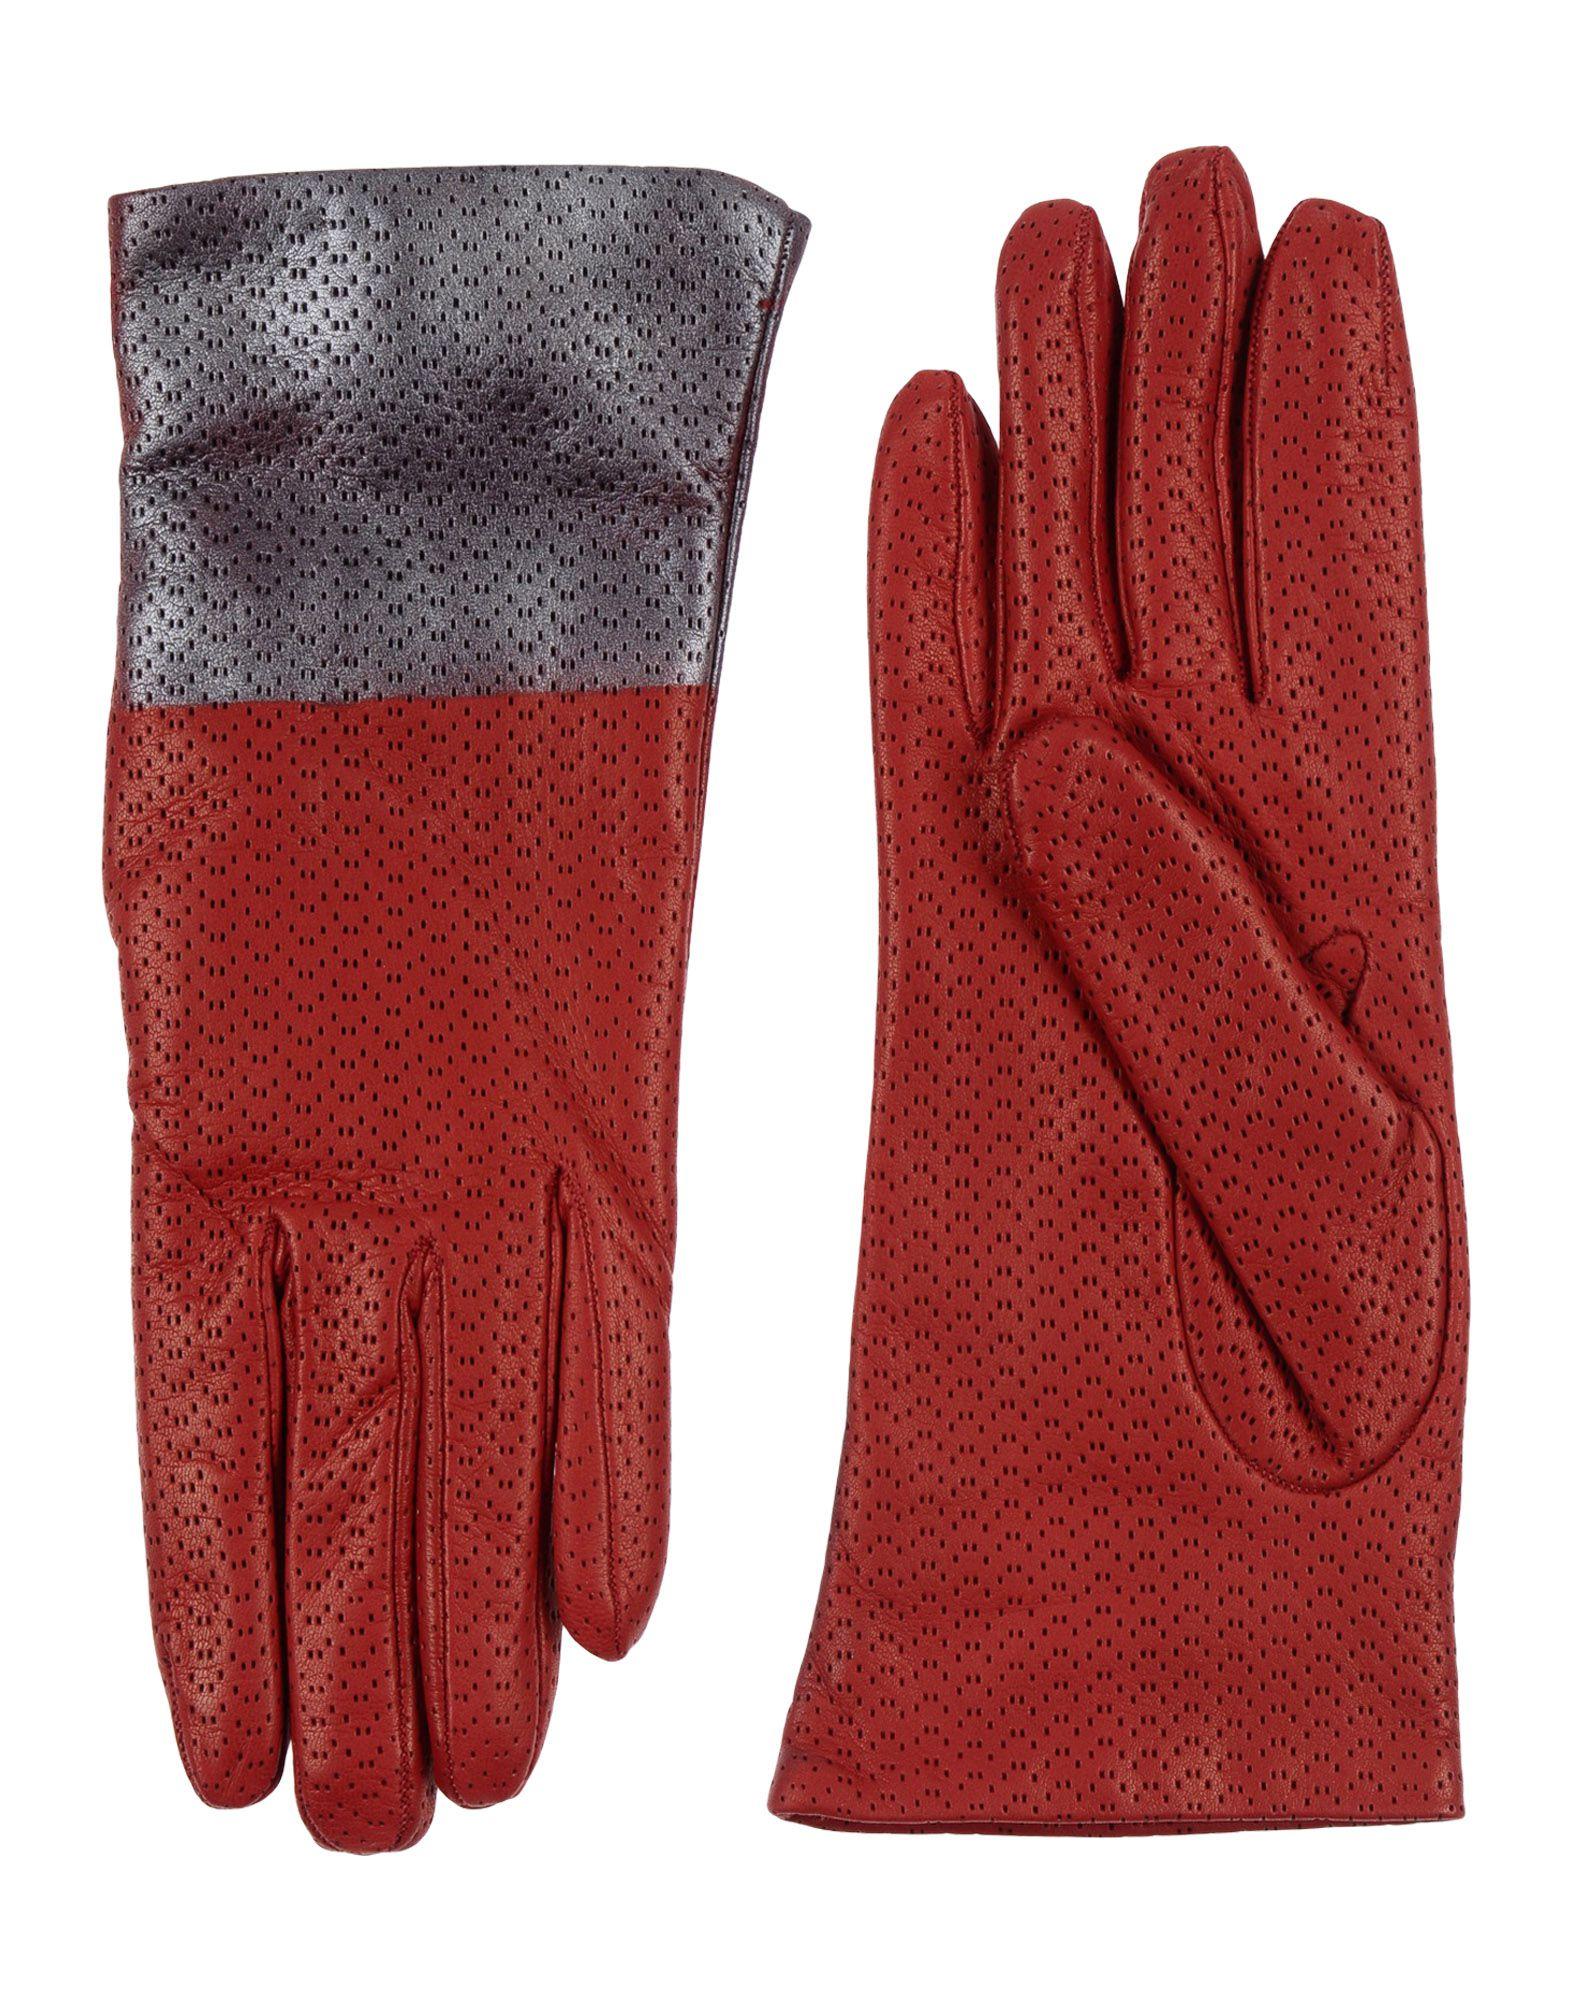 FINGERS Venezia Перчатки перчатки вратаря 15